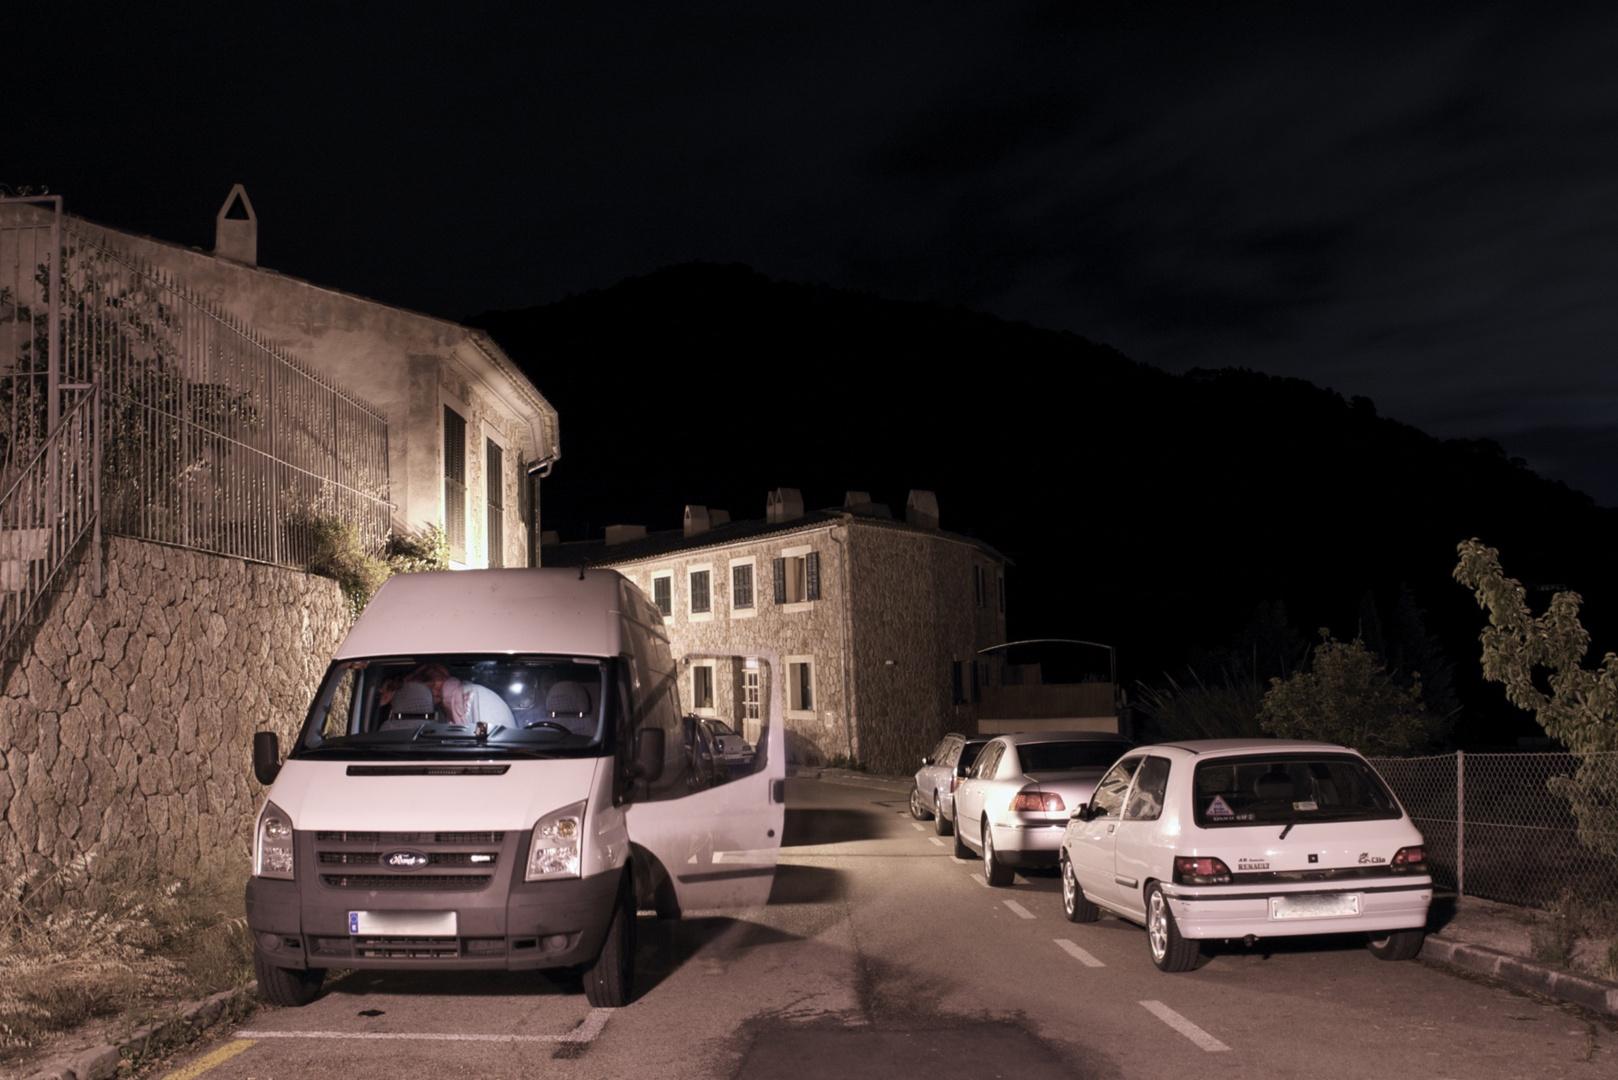 "Valldemossa, salida al aeropuerto 03:57 - 18mm F/11 30"" Iso 200"